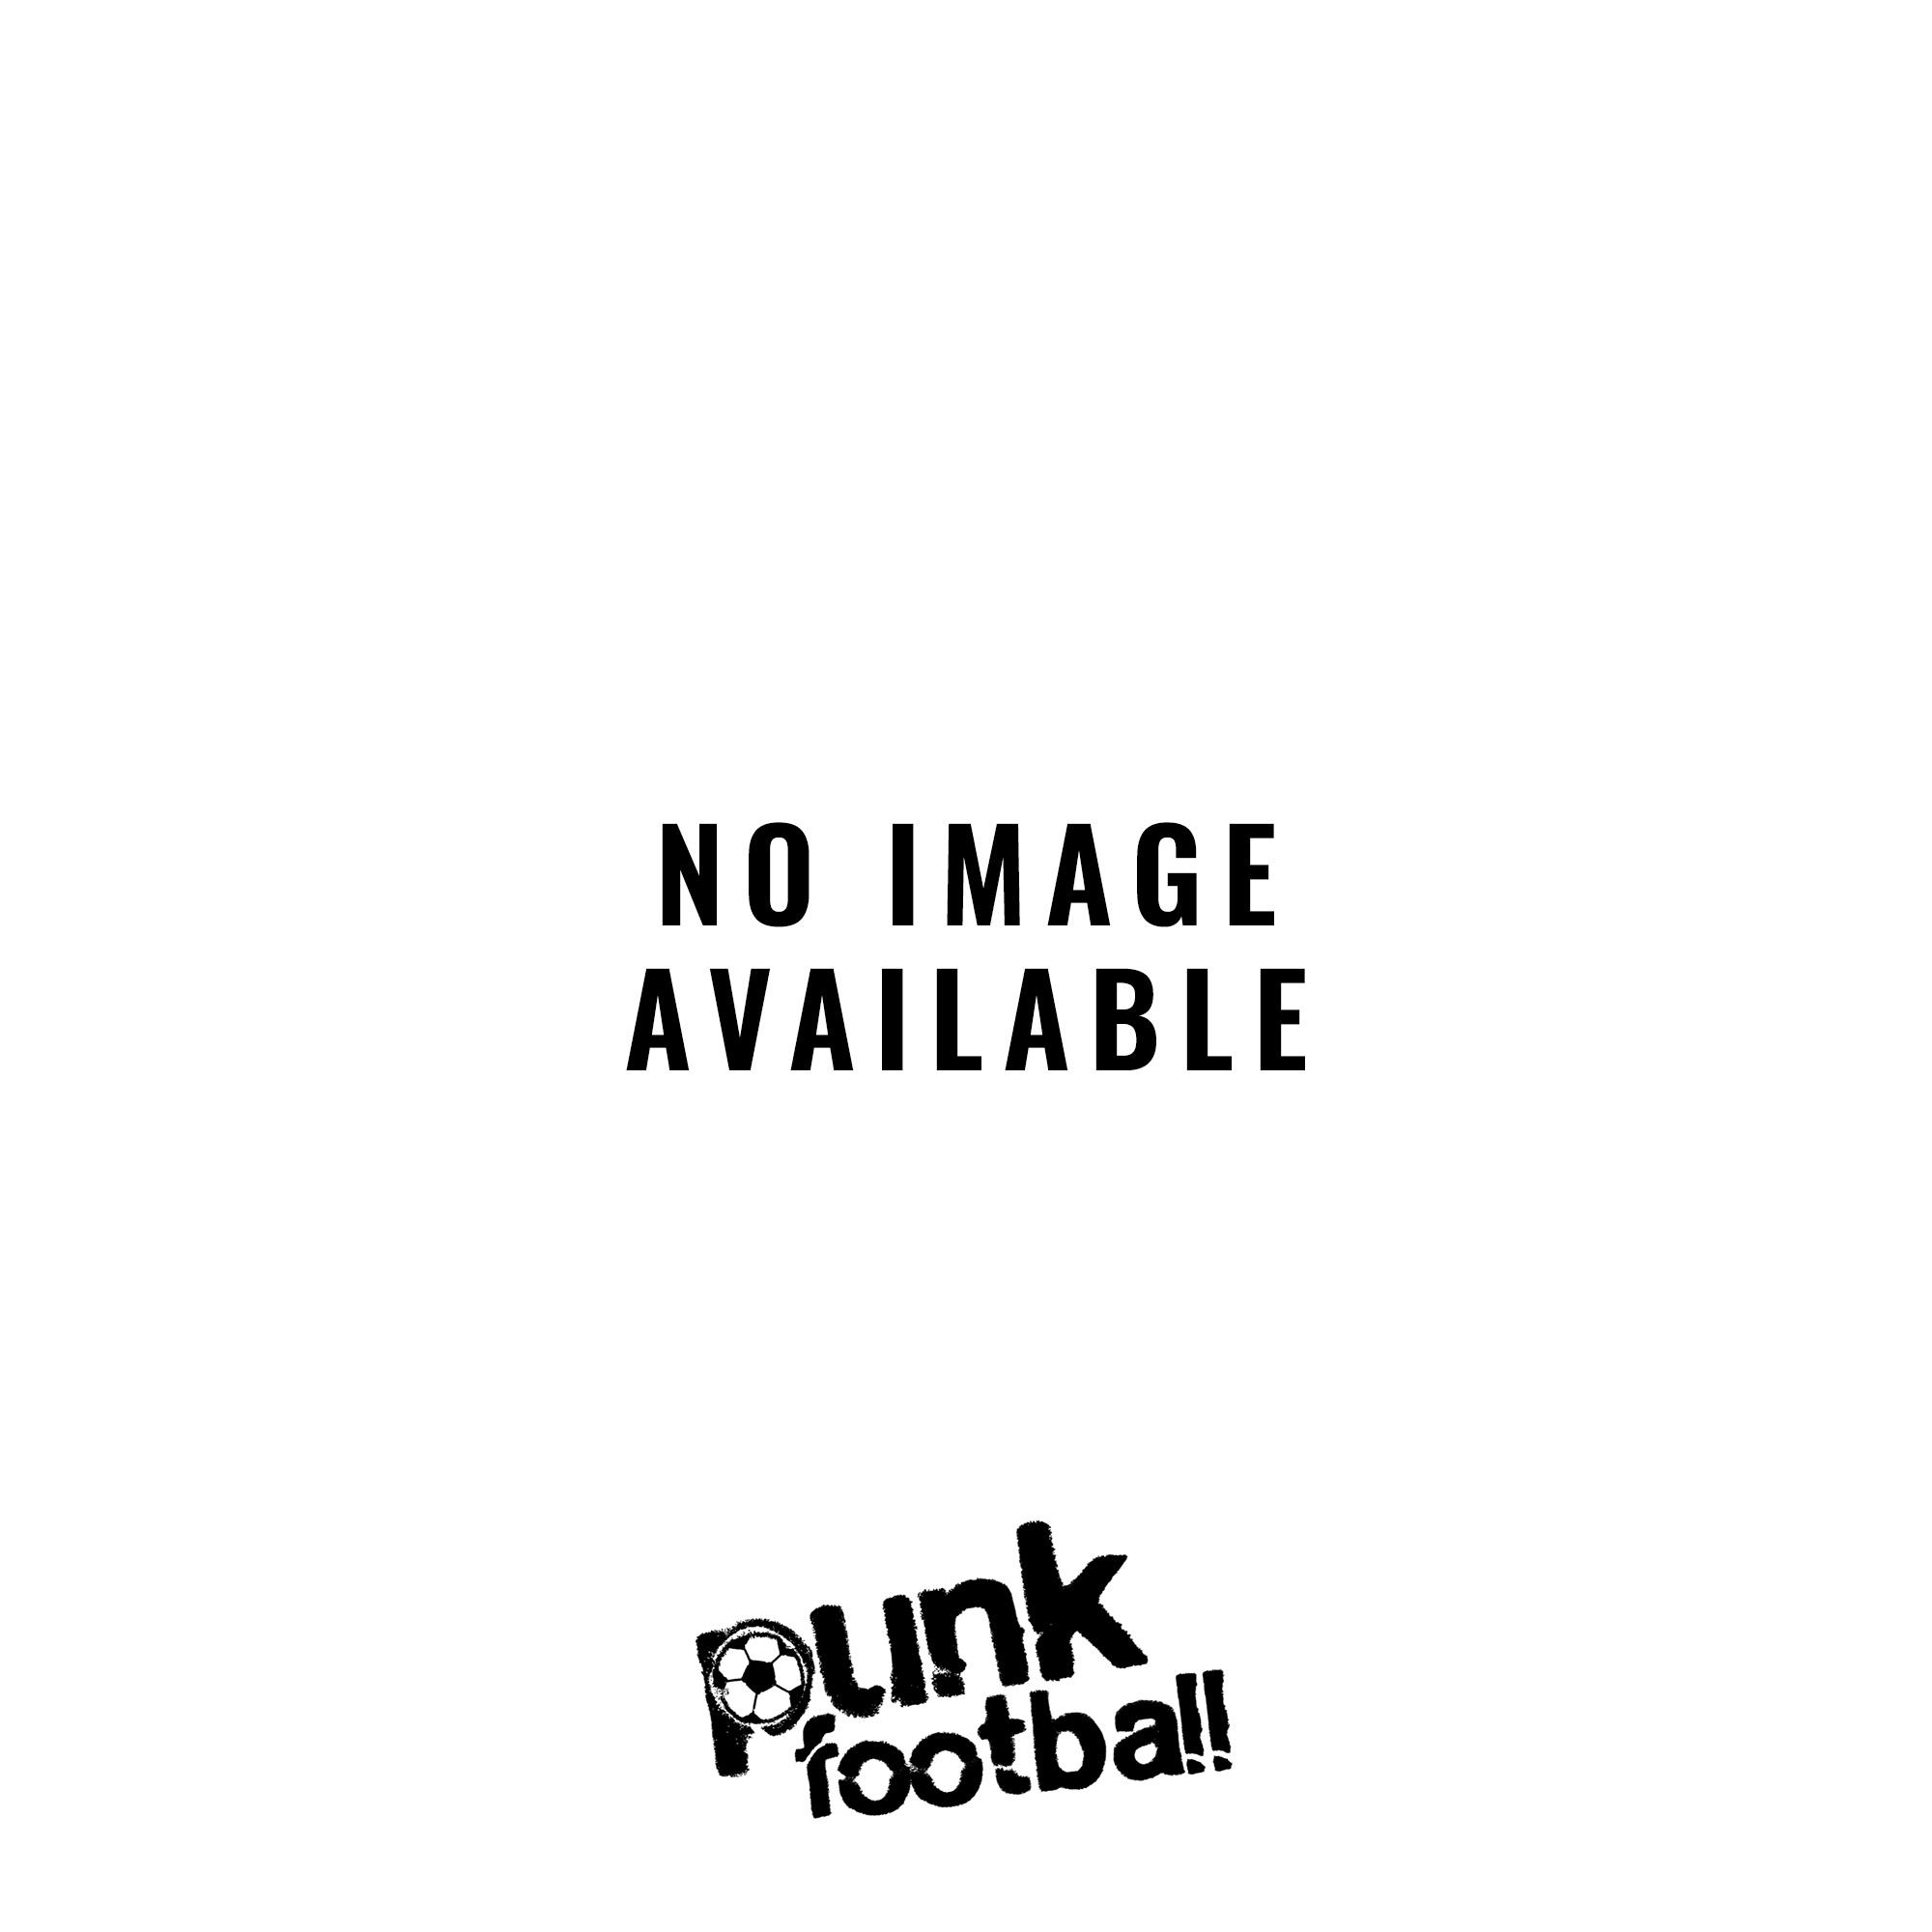 East of England (Luton Town) Hooded Sweatshirt